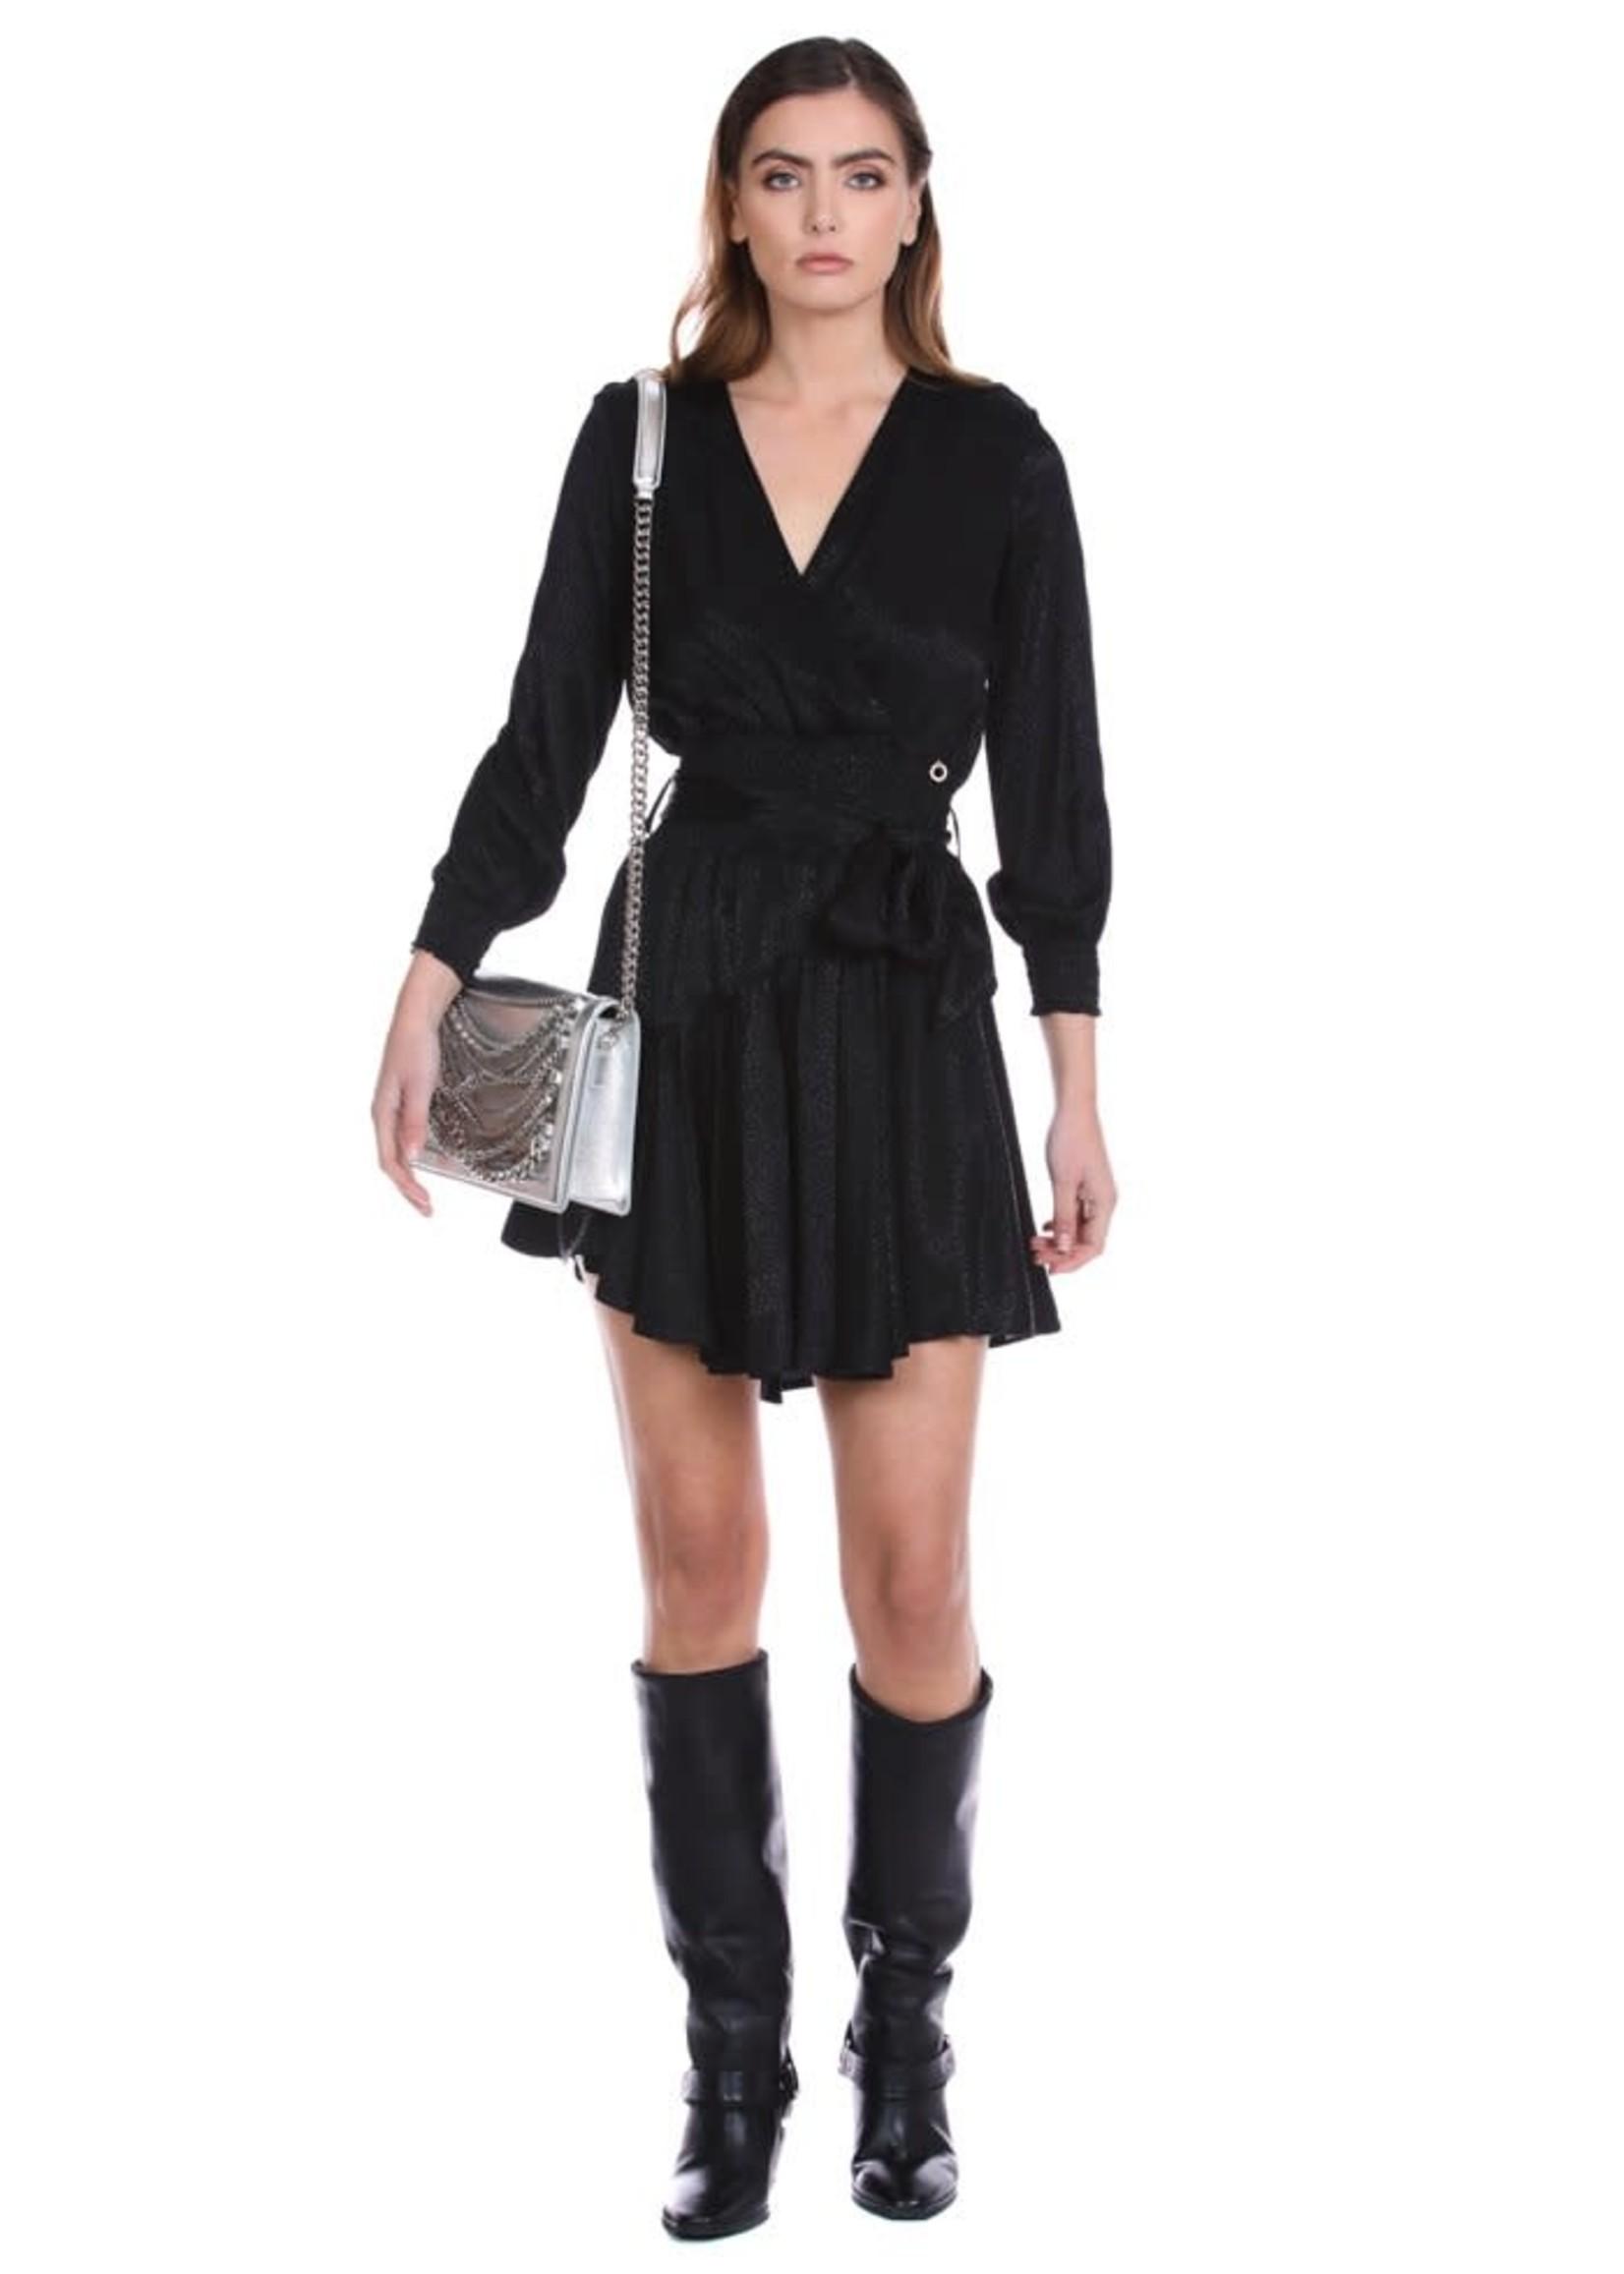 Relish PARATU Korte jurk met lange mouwen kruisende halslijn